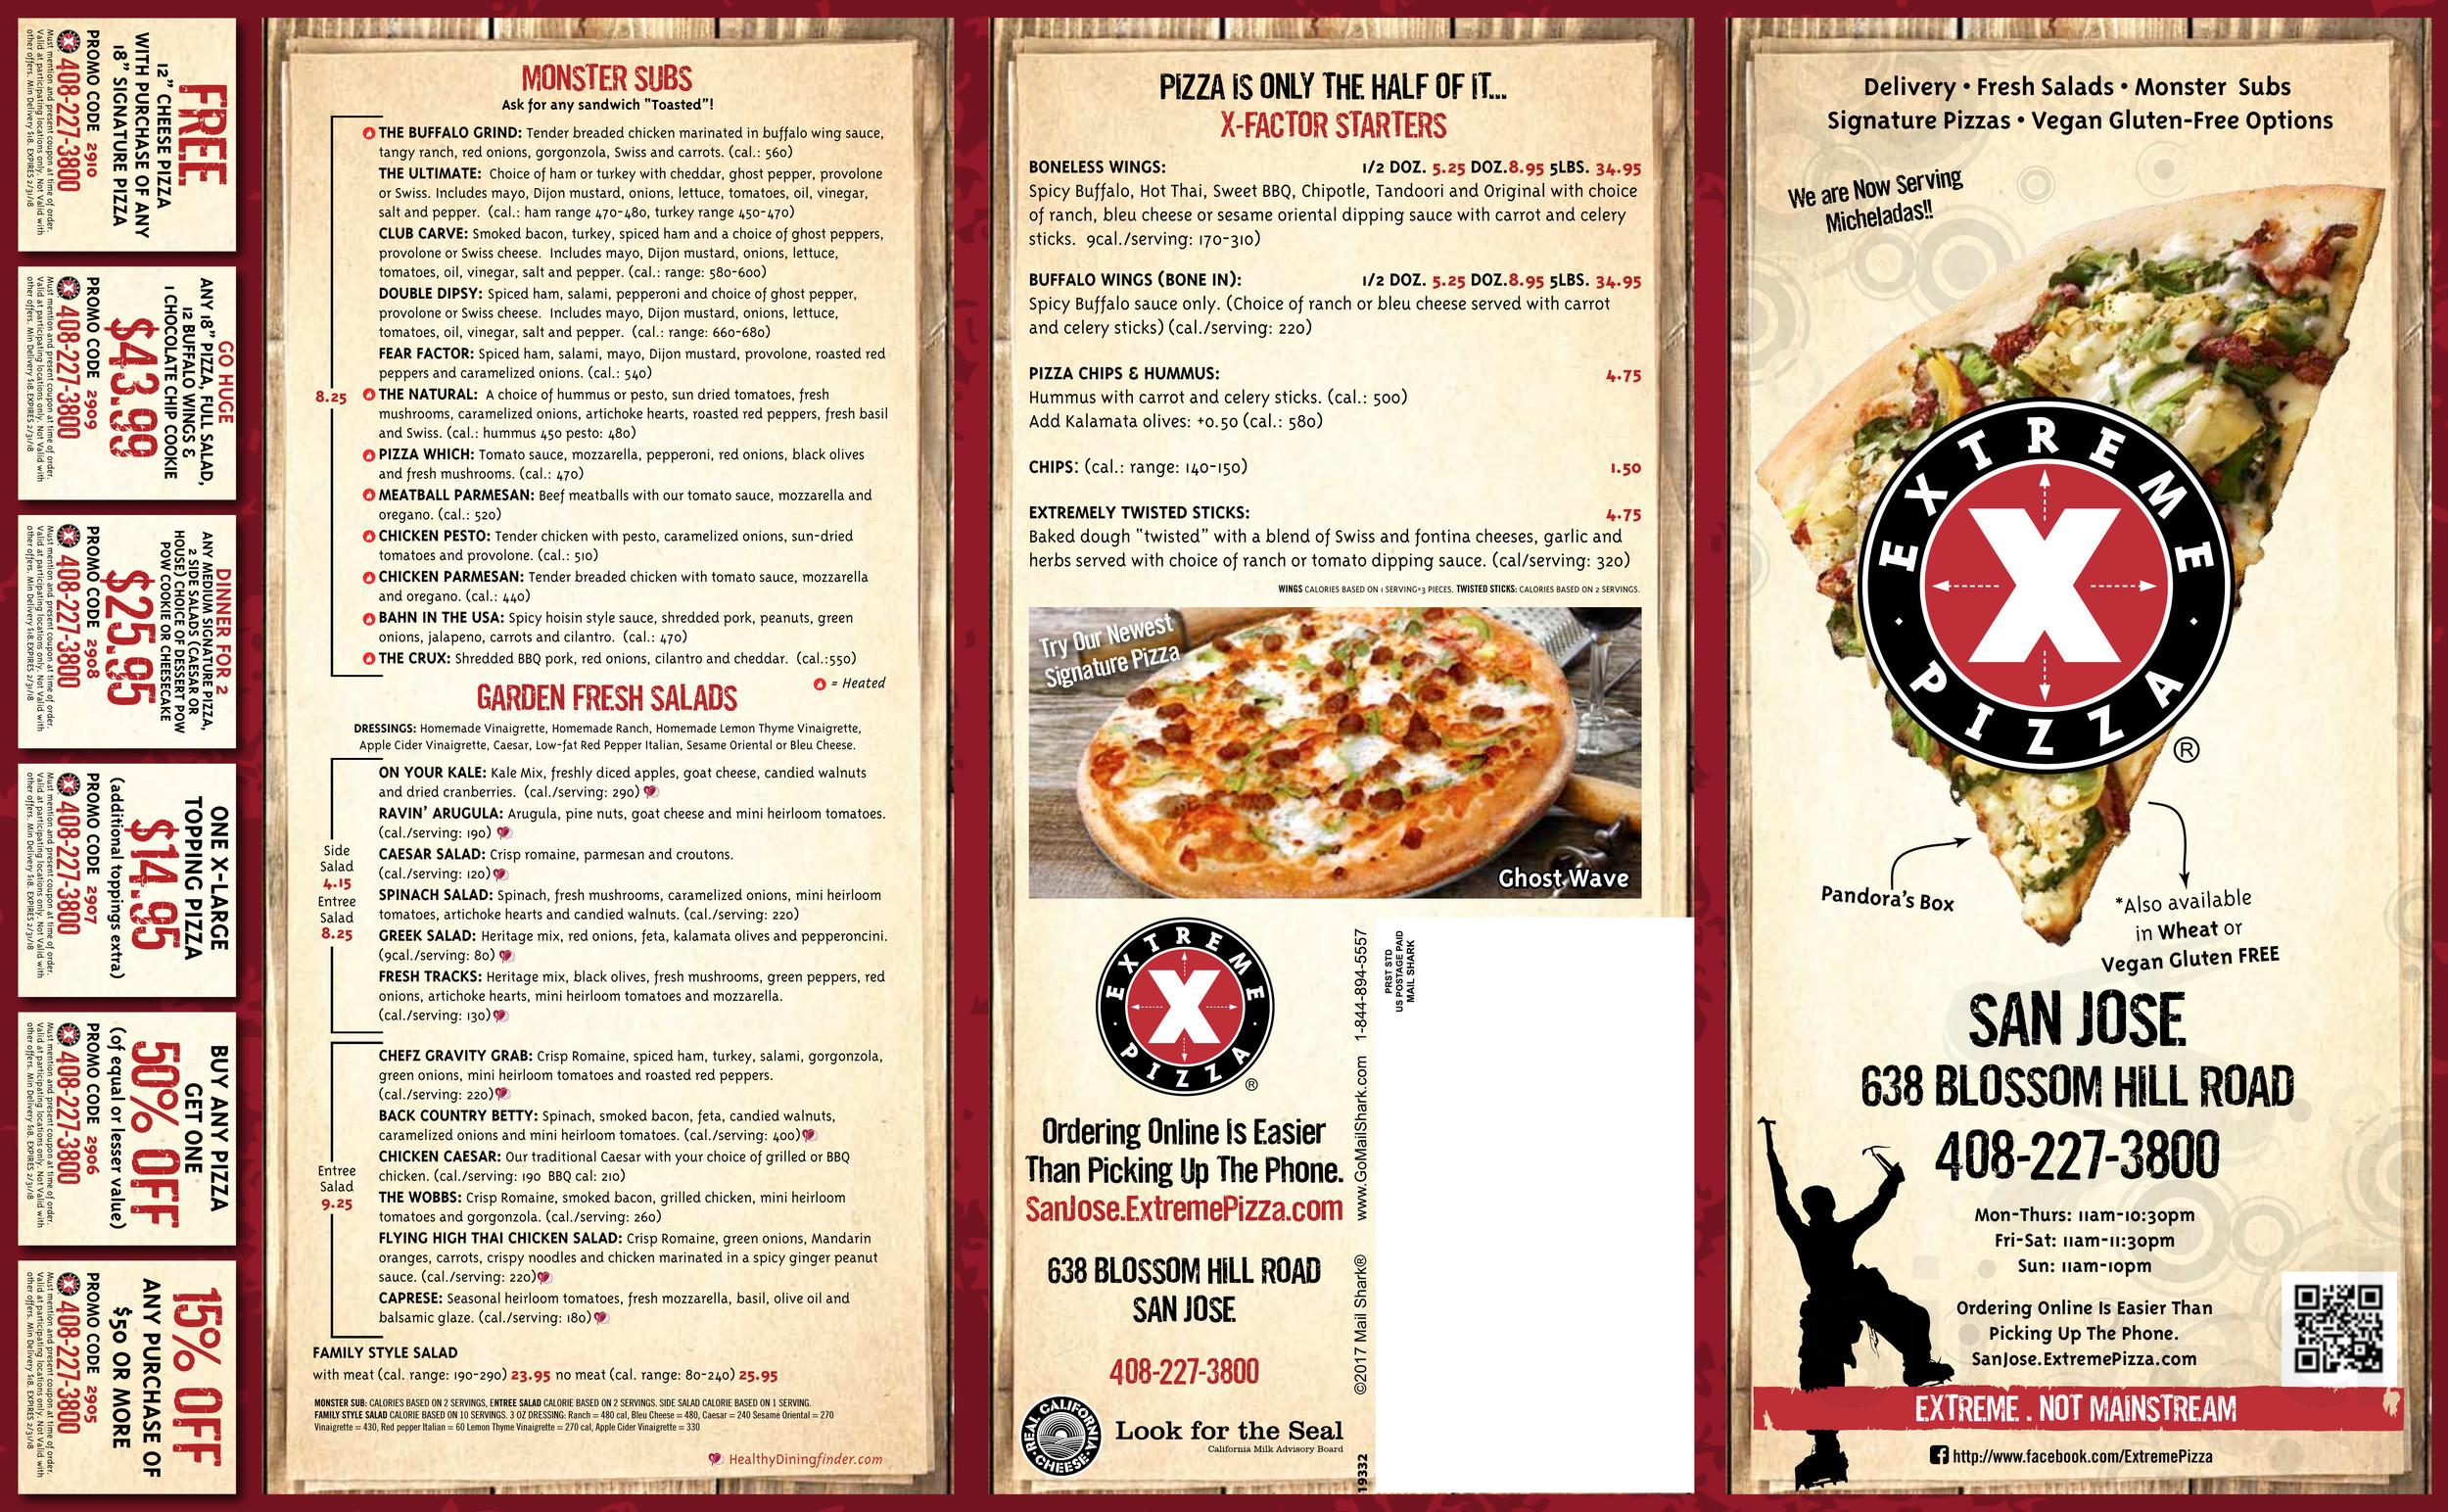 Menu for Extreme Pizza San Jose in San Jose, California